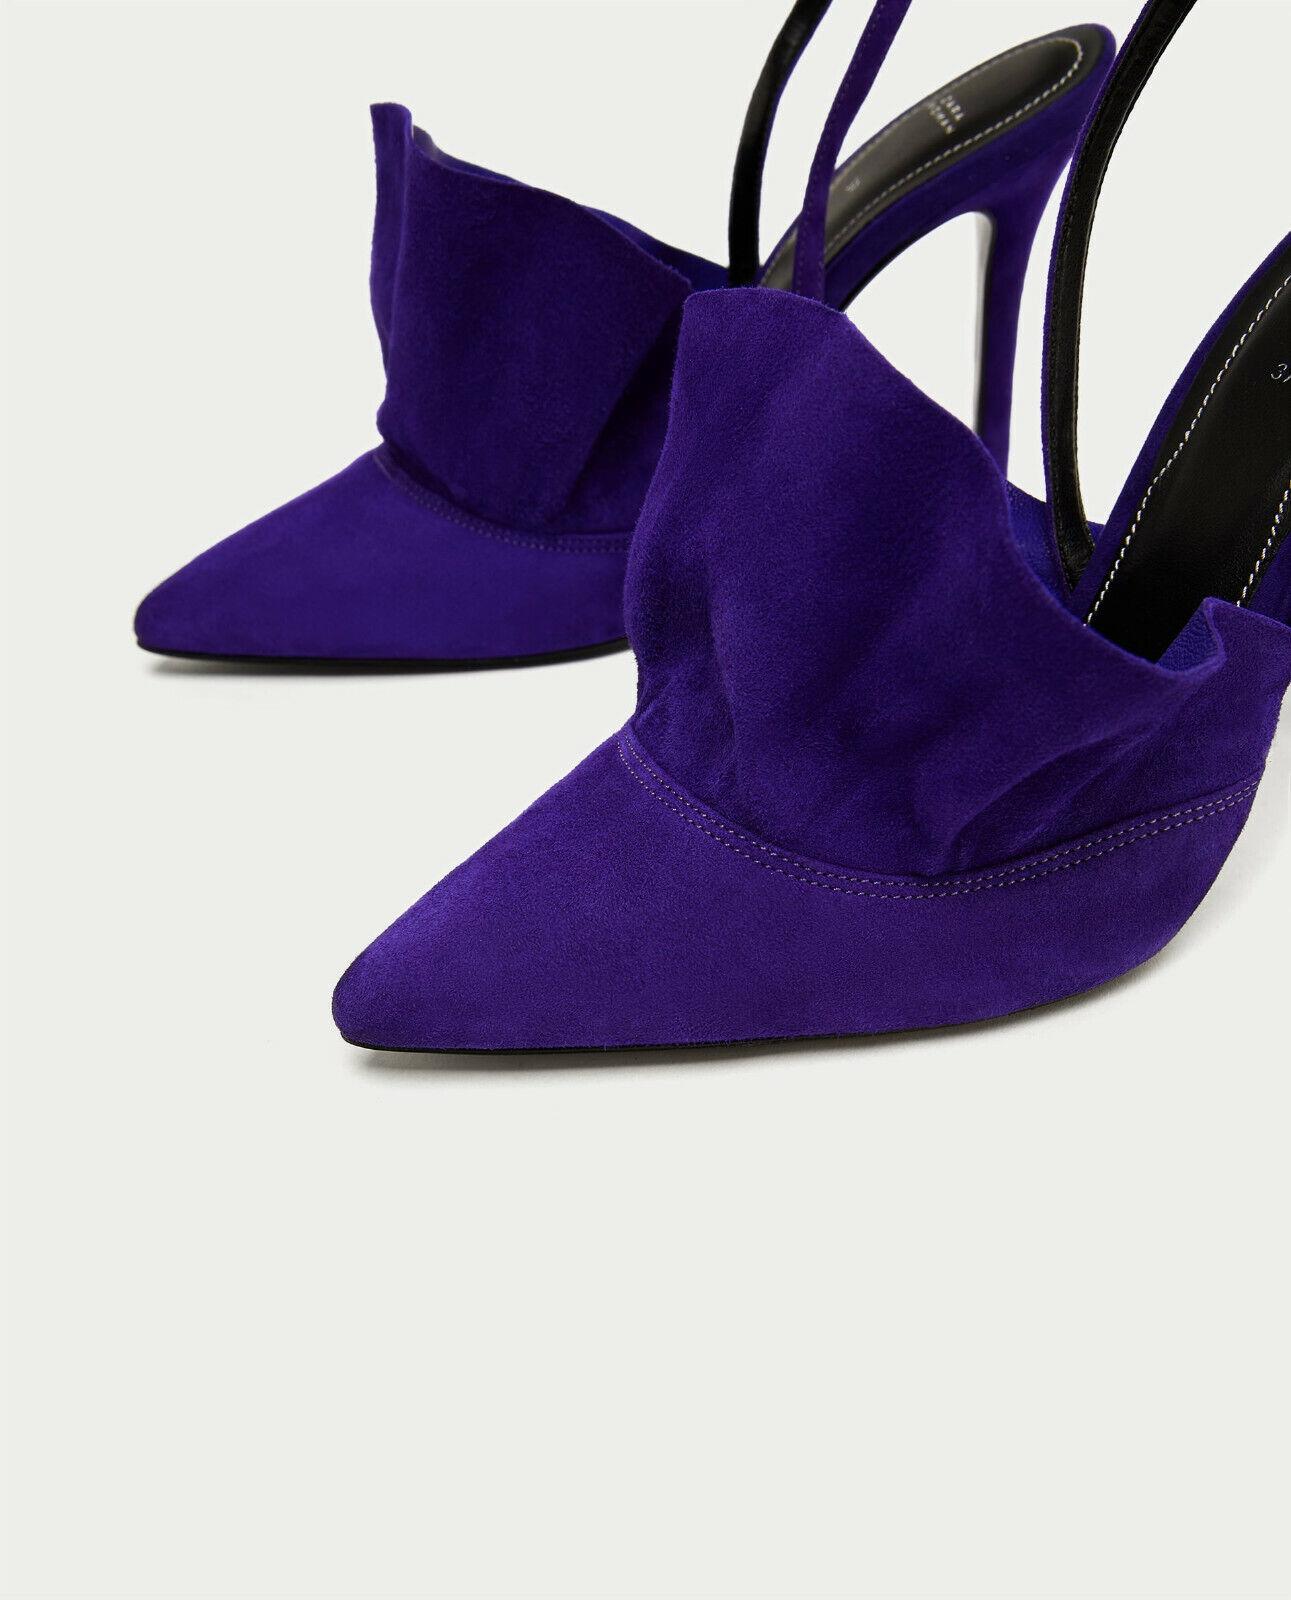 ZARA Ruffled Leather High Heel Heel Heel schuhe lila US 11 EU 42 UK 9 3847cc